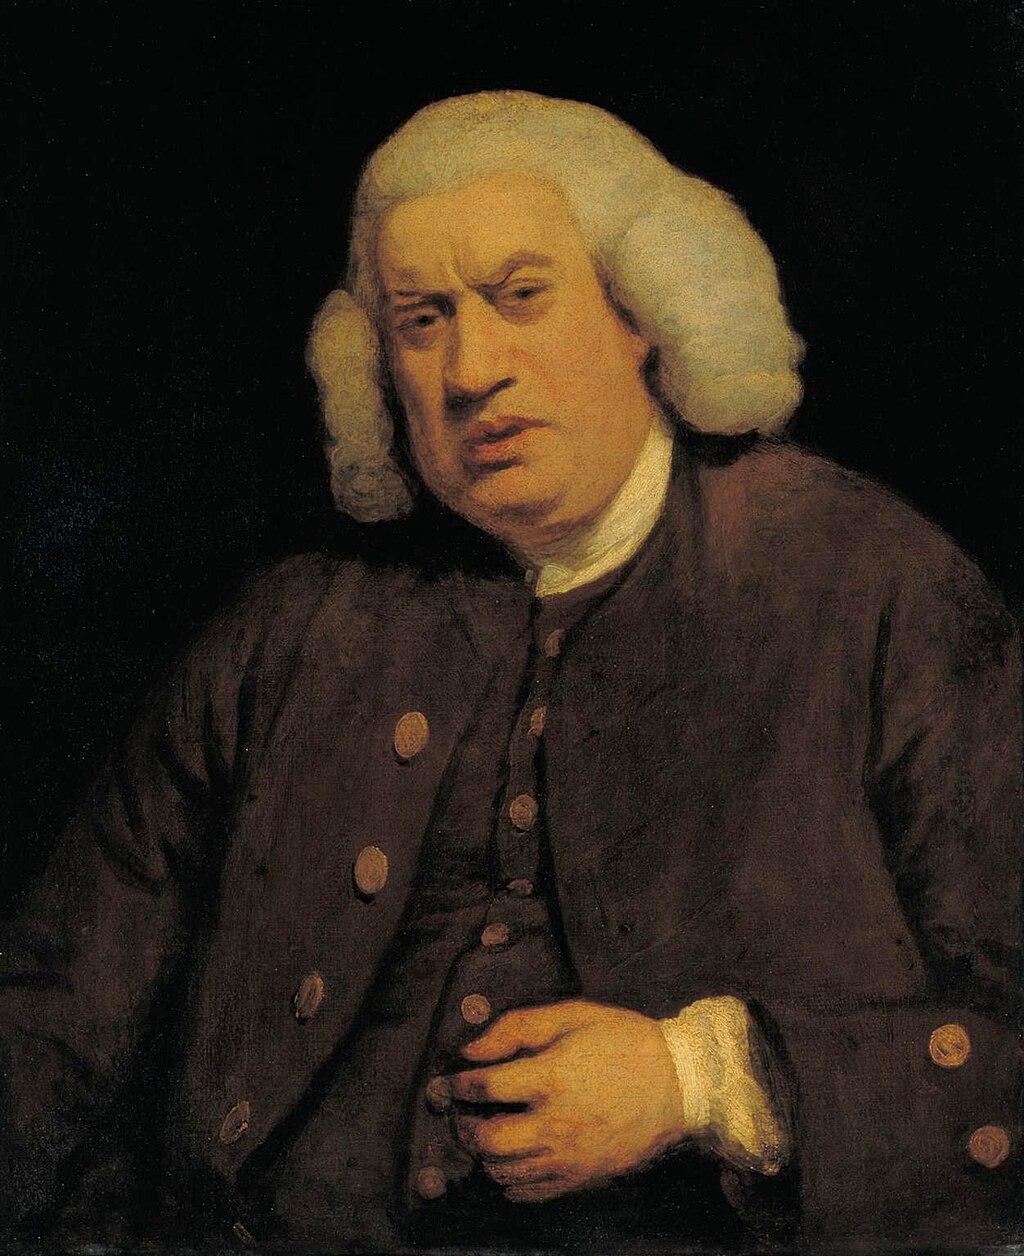 Portrait of Samuel Johnson in 1772 painted by Sir Joshua Reynolds